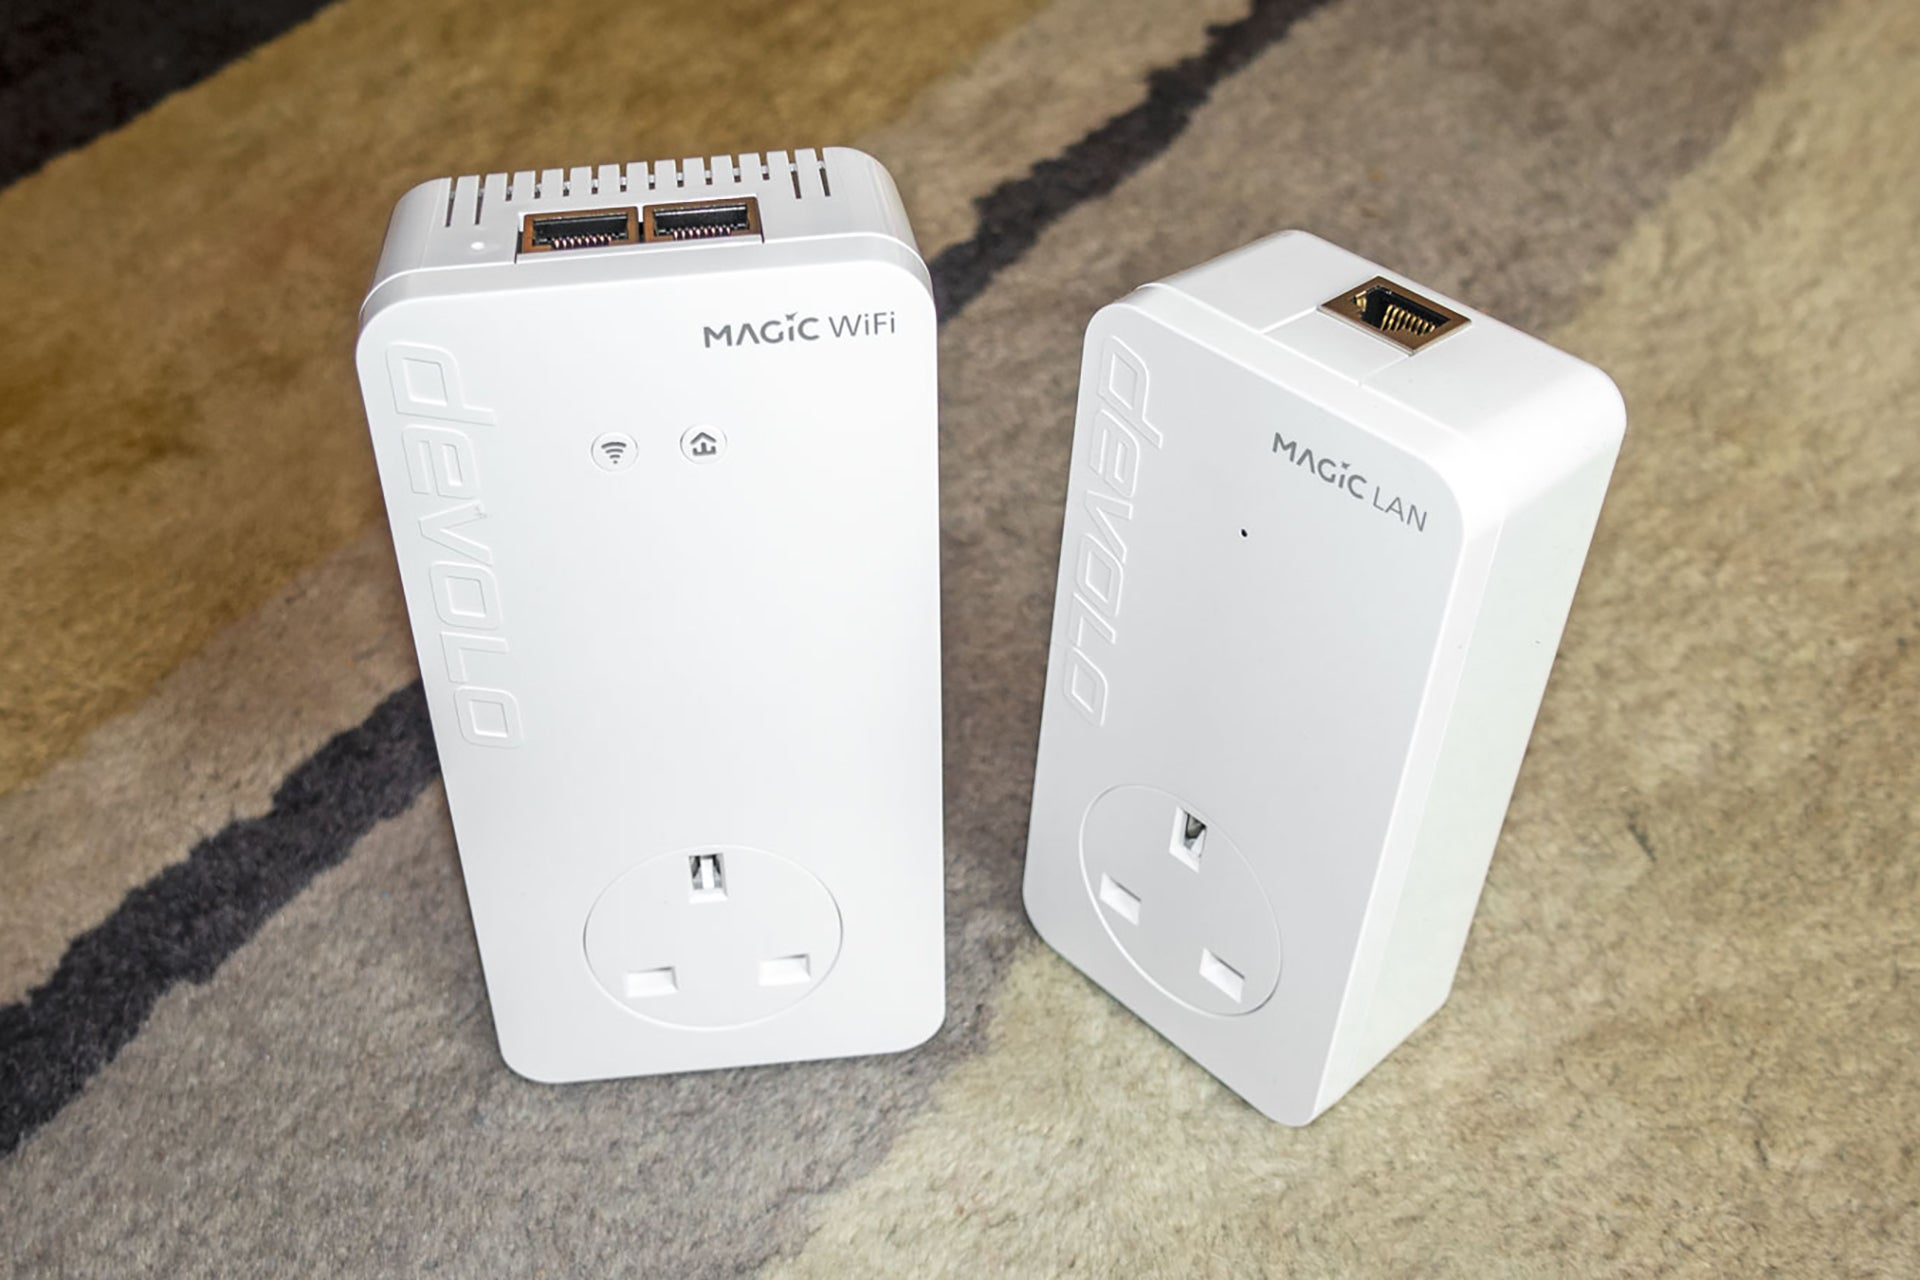 The best powerline Wi-Fi Extender is the Devolo Magic 2 WiFi next